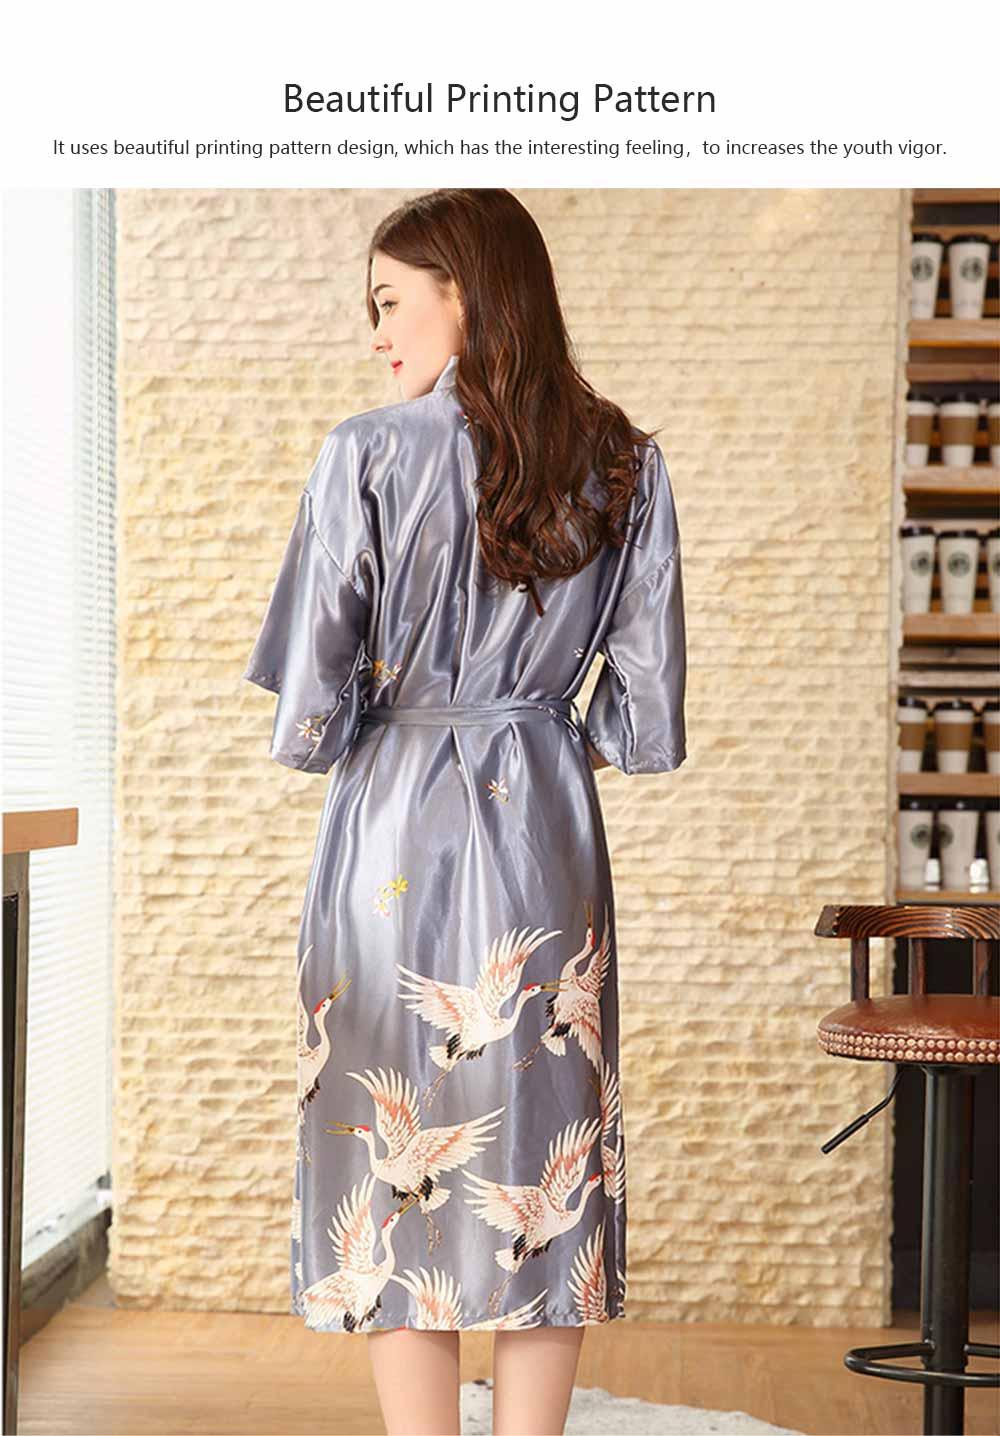 Long Sleeved Imitation Silk Fabric Sexy Bathrobe, Beautiful Printing Pattern  Ladies' Pajamas Women Sleepwear 2